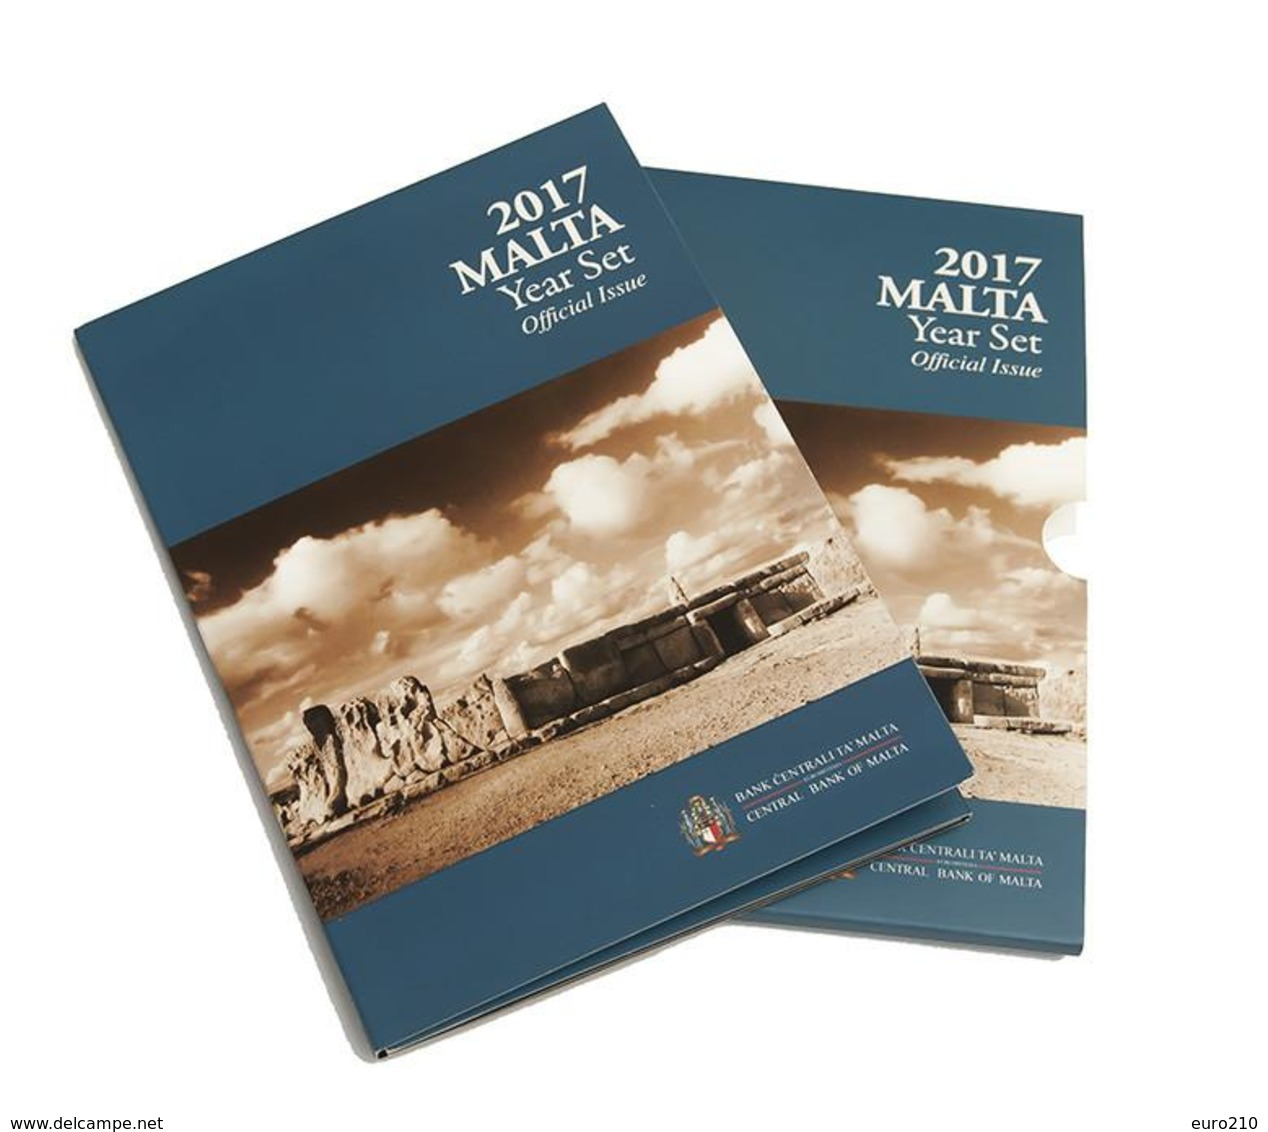 MALTA EURO COIN SET 2017 - 9 Coins - BU - With Mintmark F - Malta